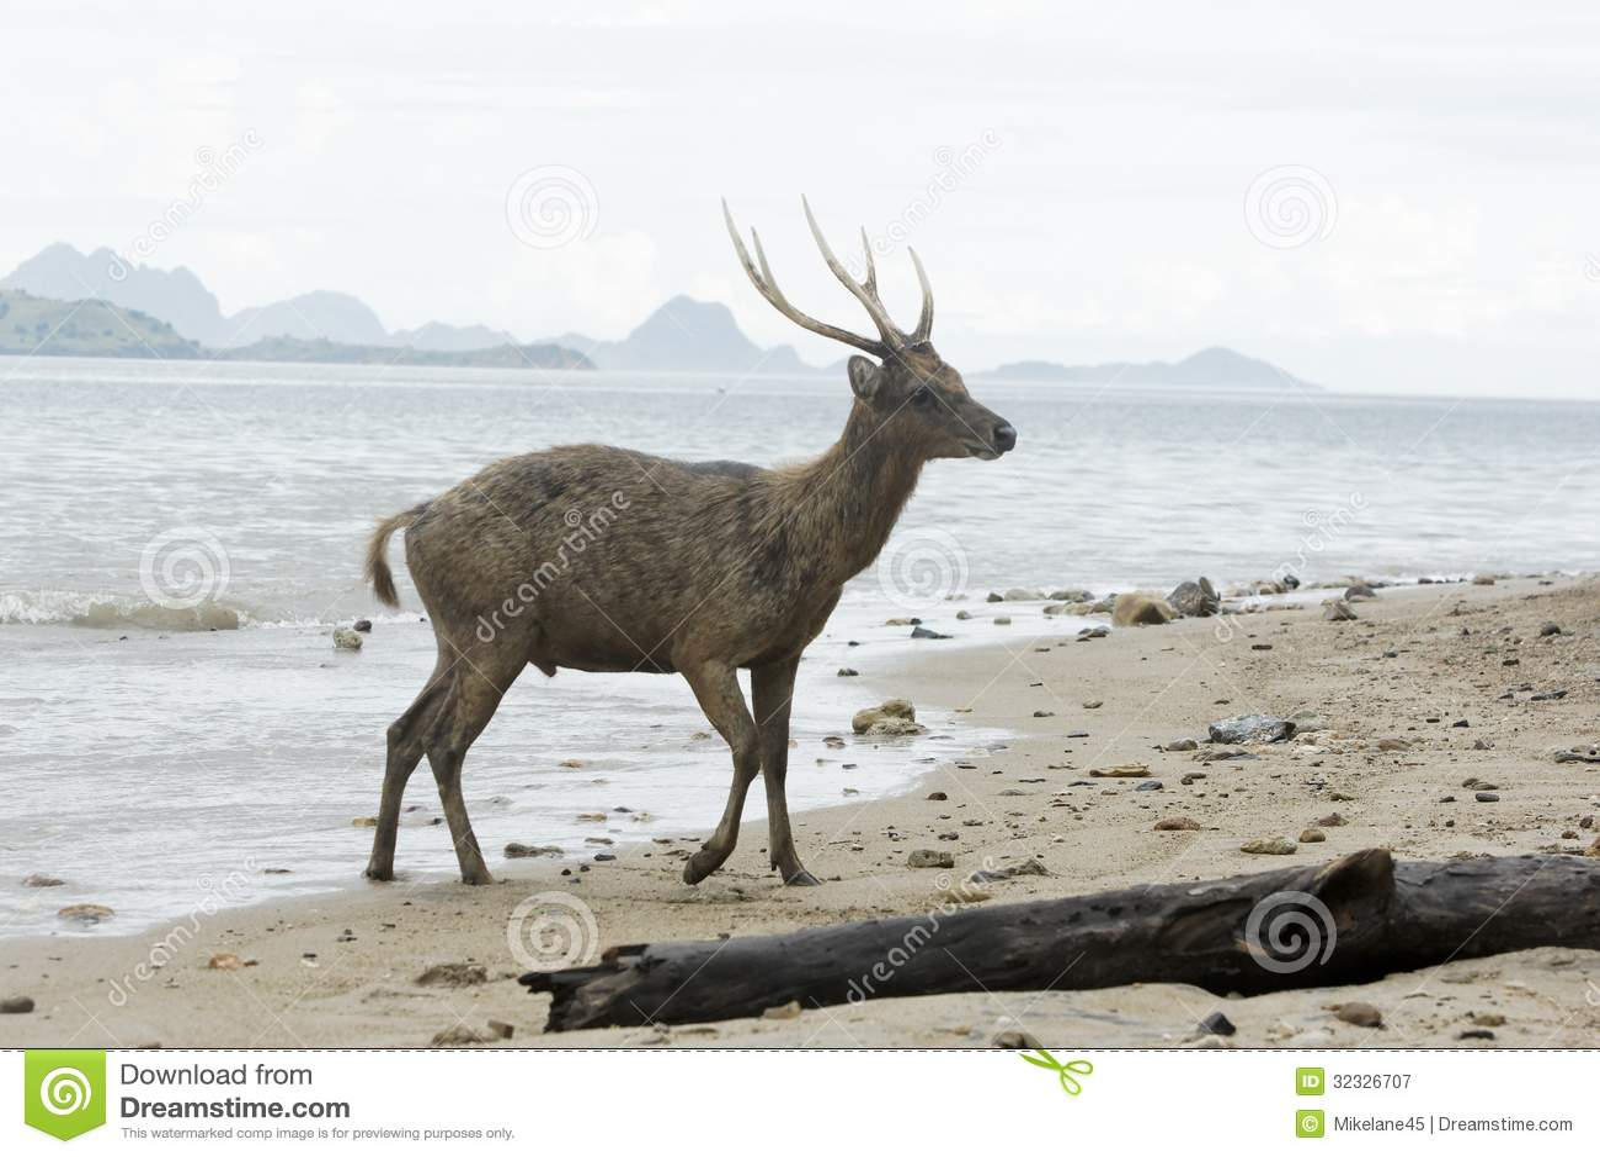 muslim single men in deer isle Deer isle – marjorie weith capen, 92, passed away peacefully nov 30, 2010, at blue hill memorial hospital she was born feb 8, 1918, in pittsburgh, to dr albert and margaret mccreery her.